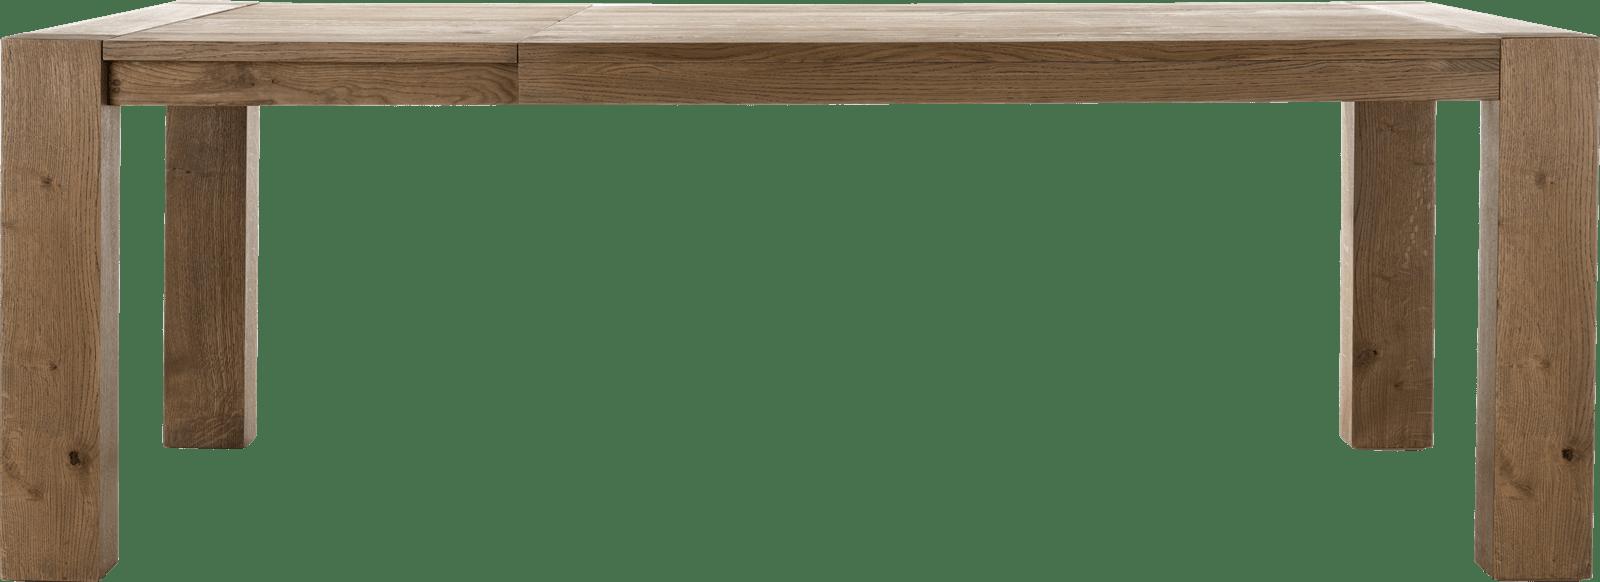 Santorini - table a rallonge 160 (+ 60) x 100 cm